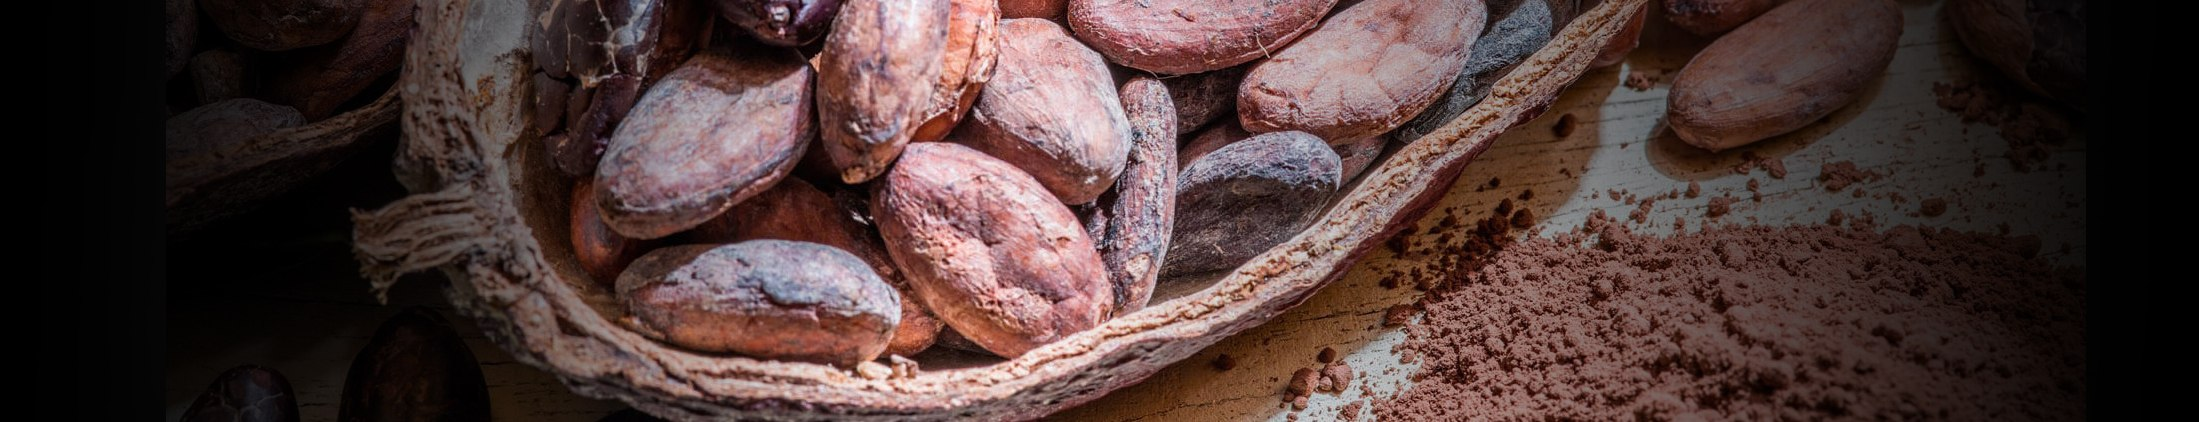 /news/chocolate-production-process